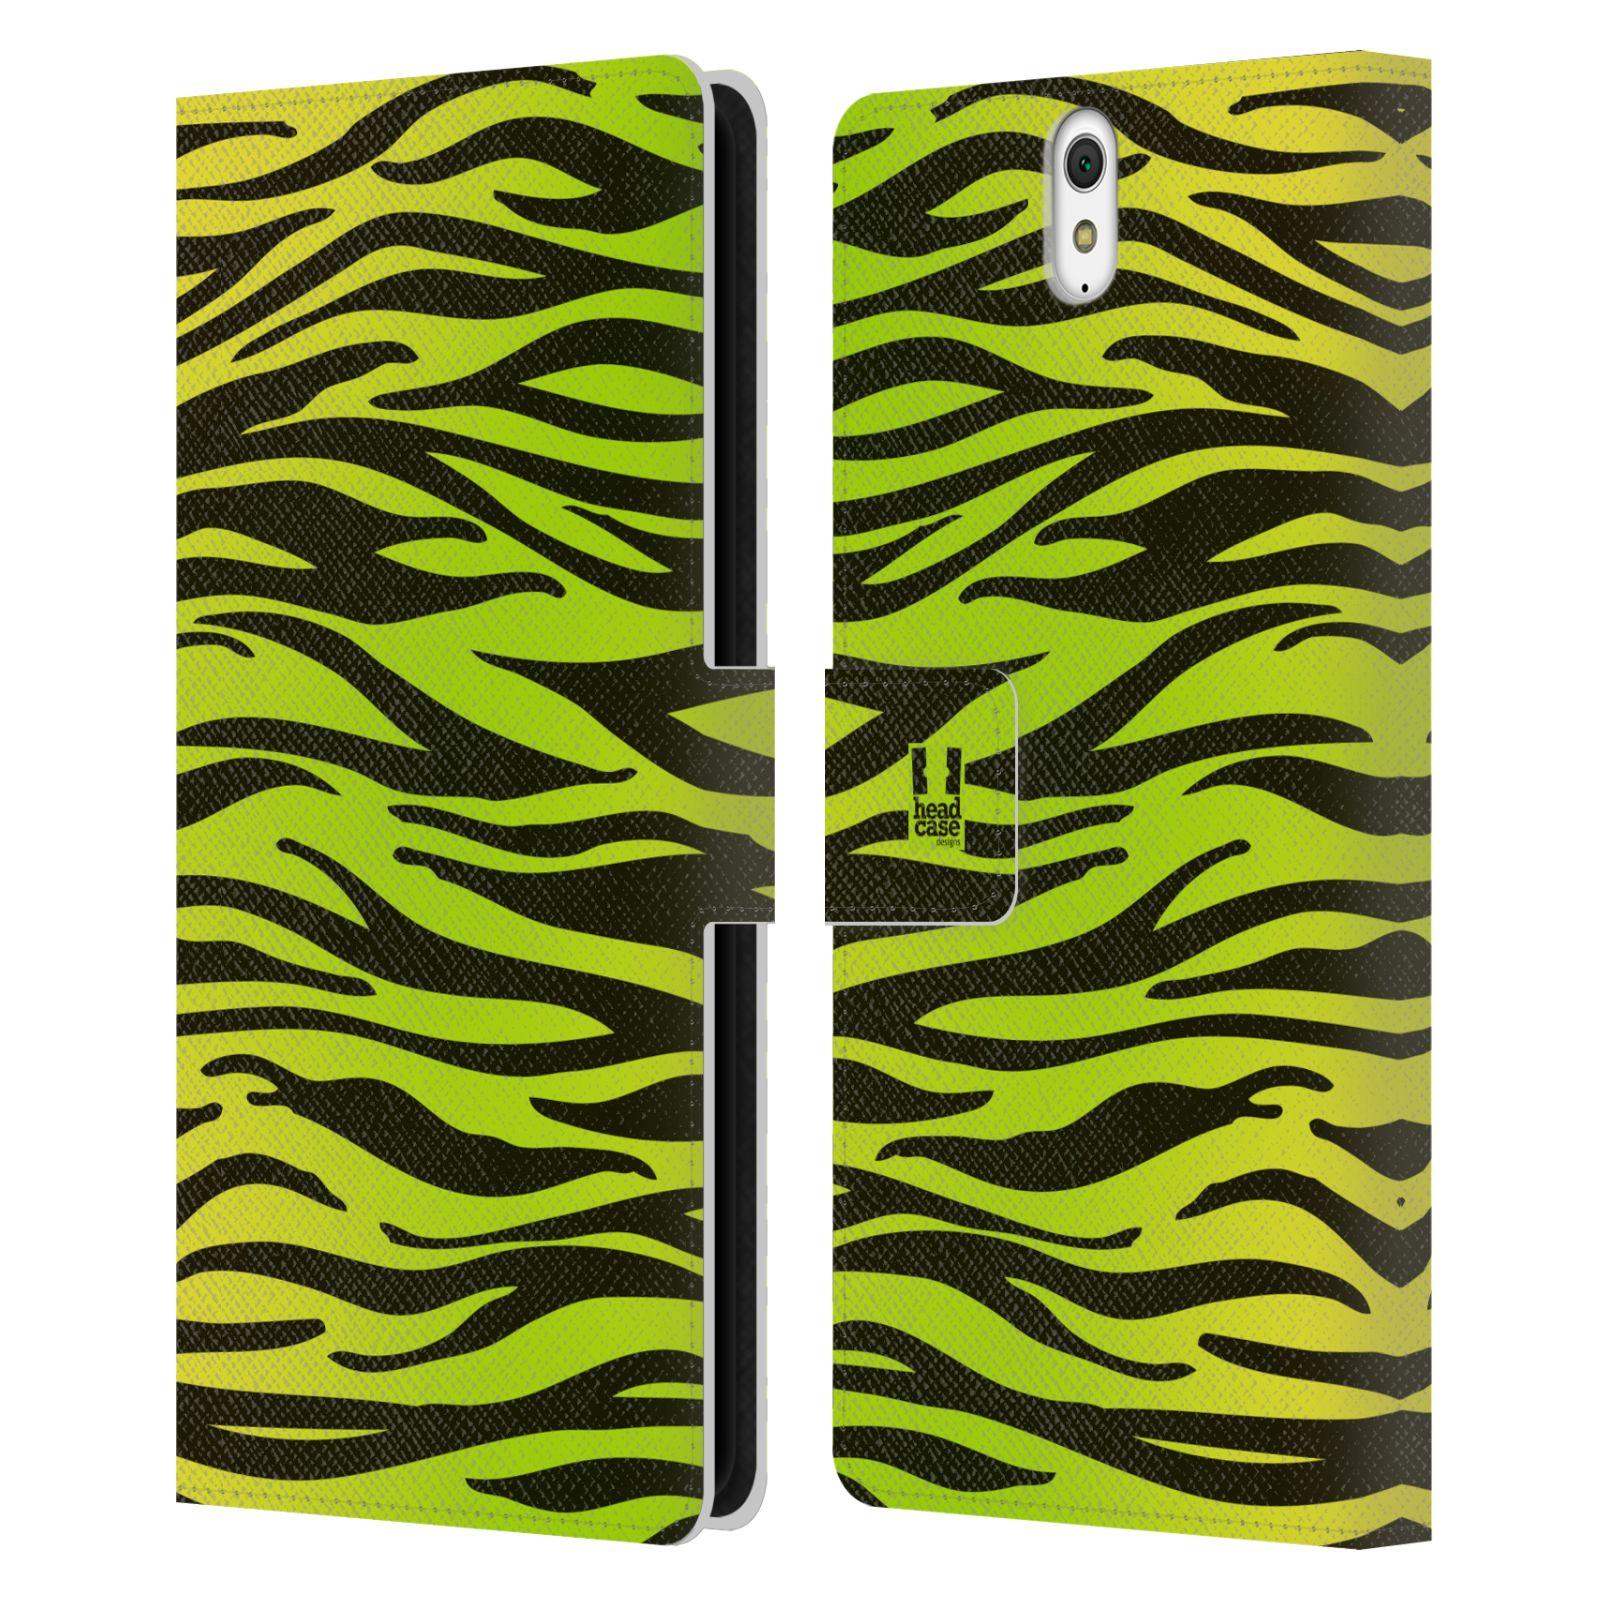 HEAD CASE Flipové pouzdro pro mobil SONY XPERIA C5 Ultra Zvířecí barevné vzory žlutozelená zebra